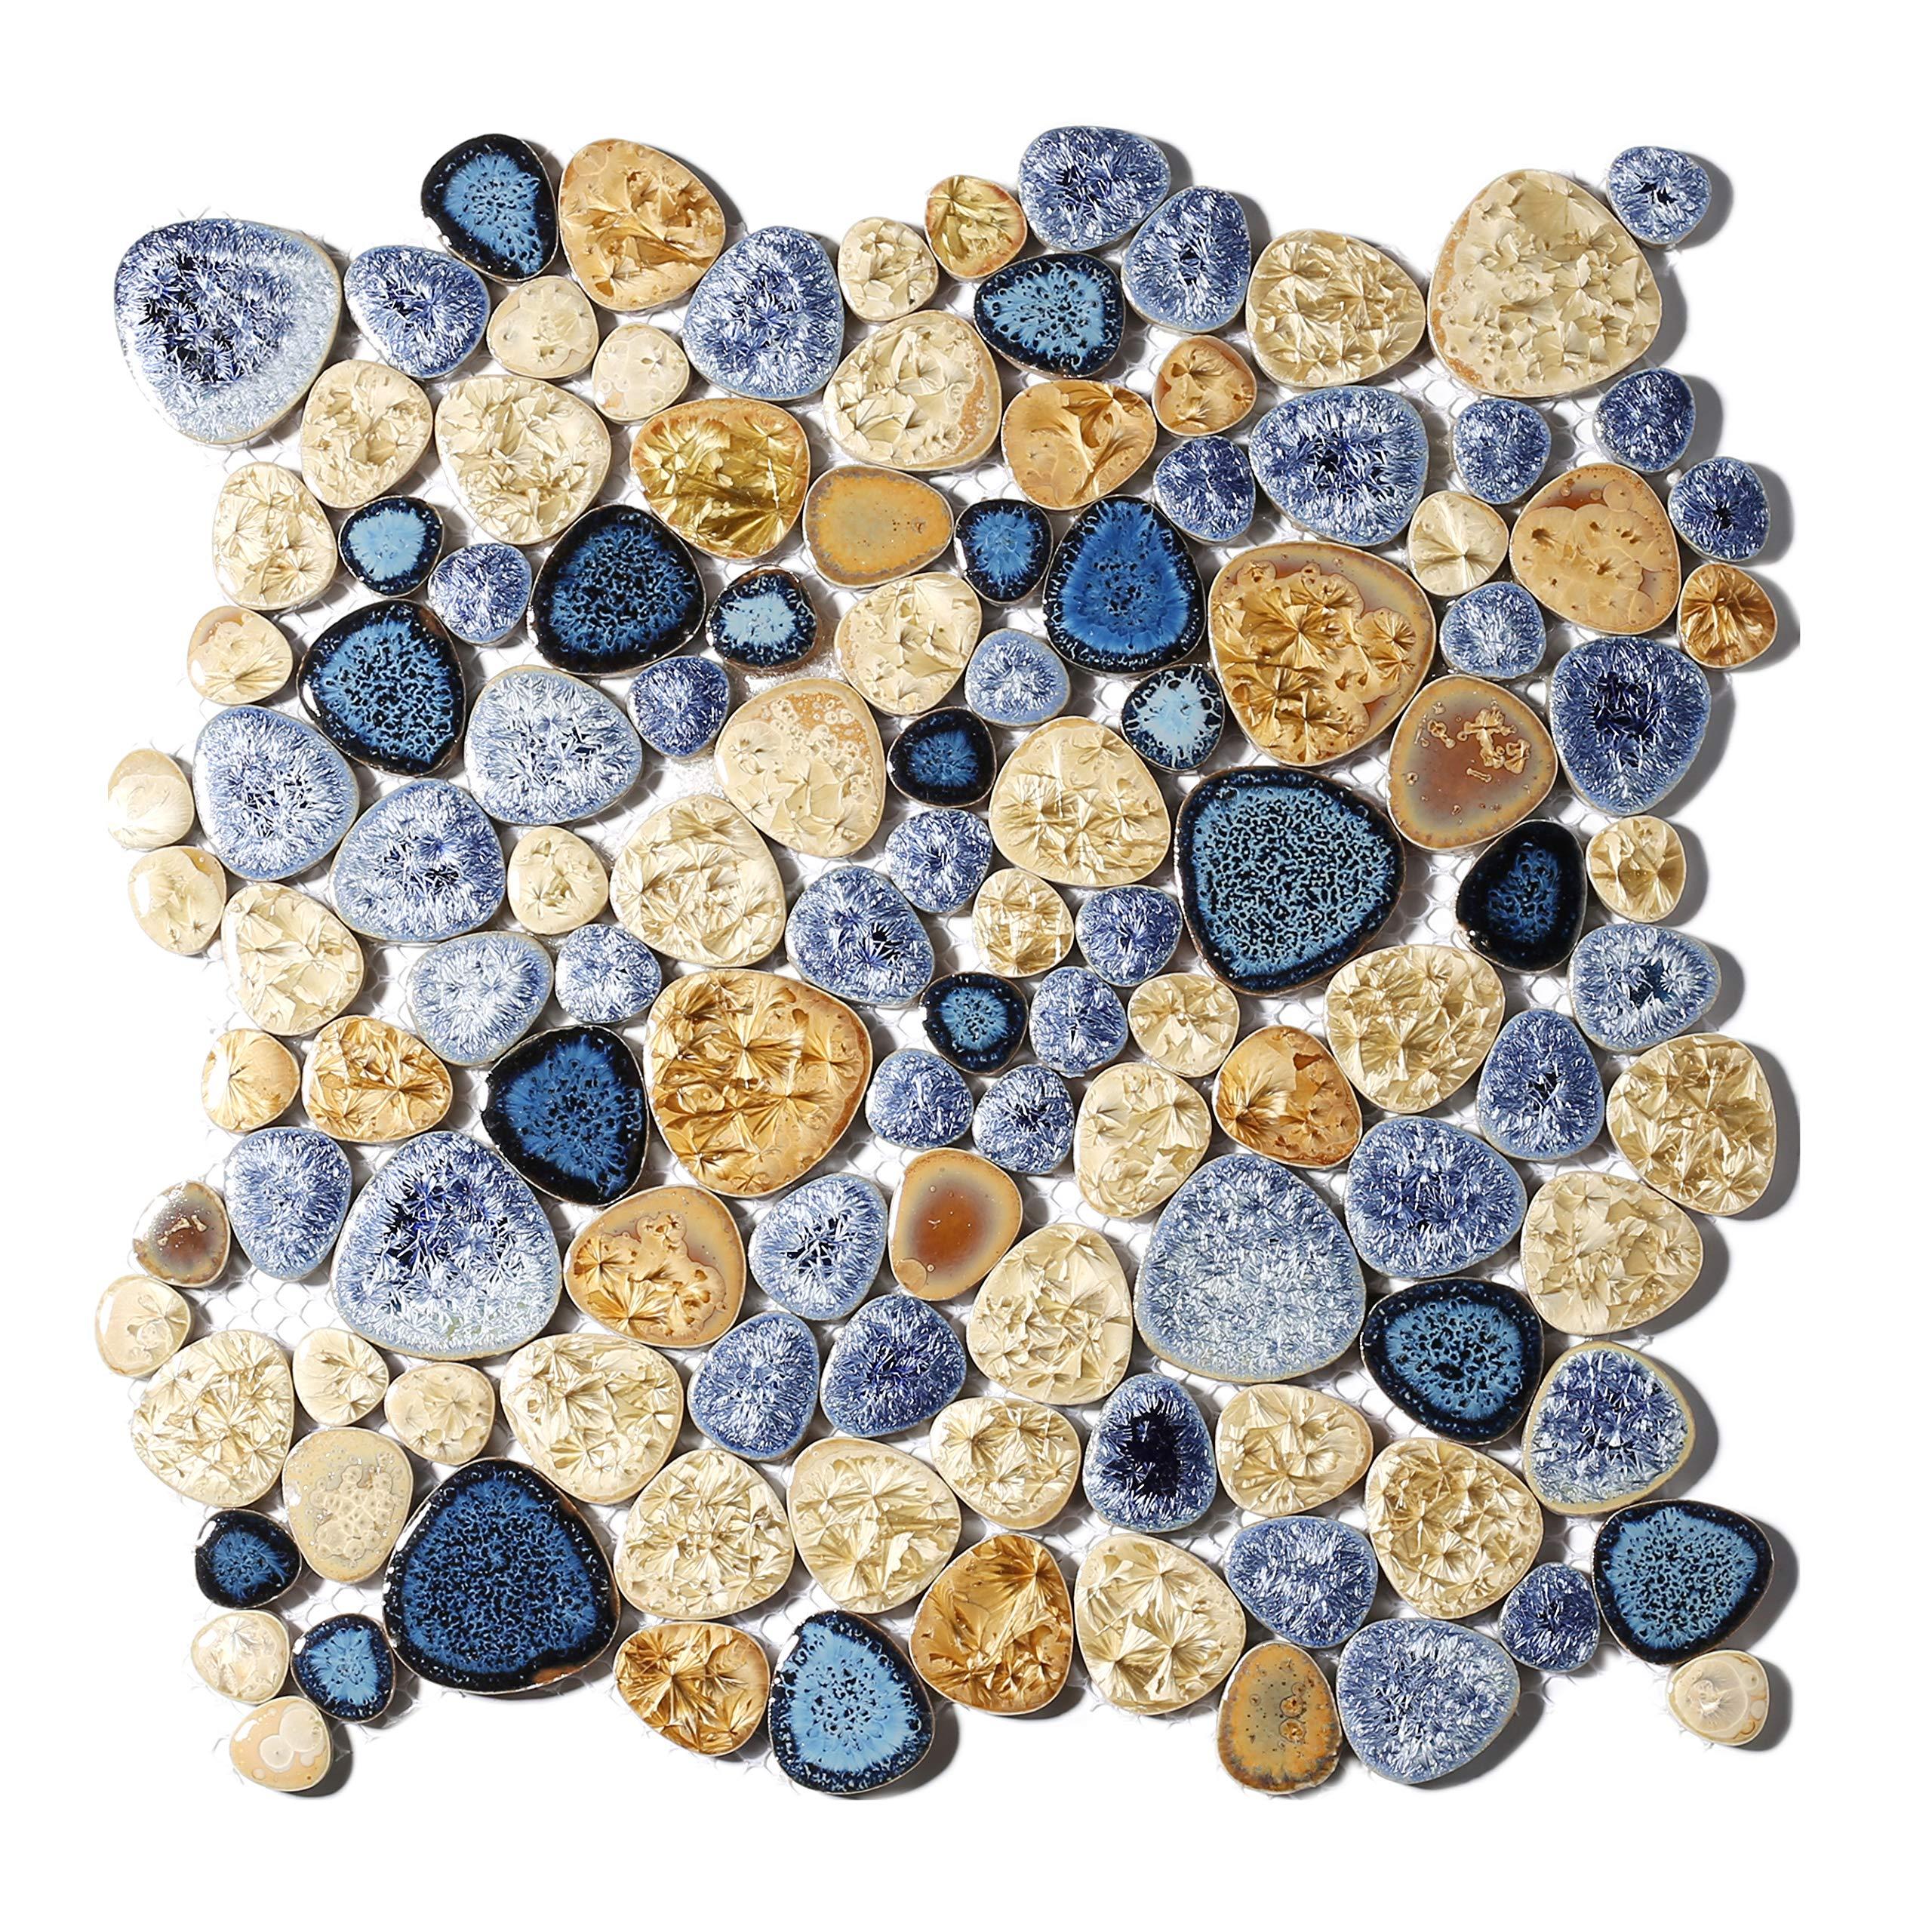 Glazed Blue Mosaic Ceramic Pebble Porcelain Tile Swimming Pool Bath Shower Wall Flooring Tile TSTGPT001 (10 Square Feet) by BLUJELLYFISH